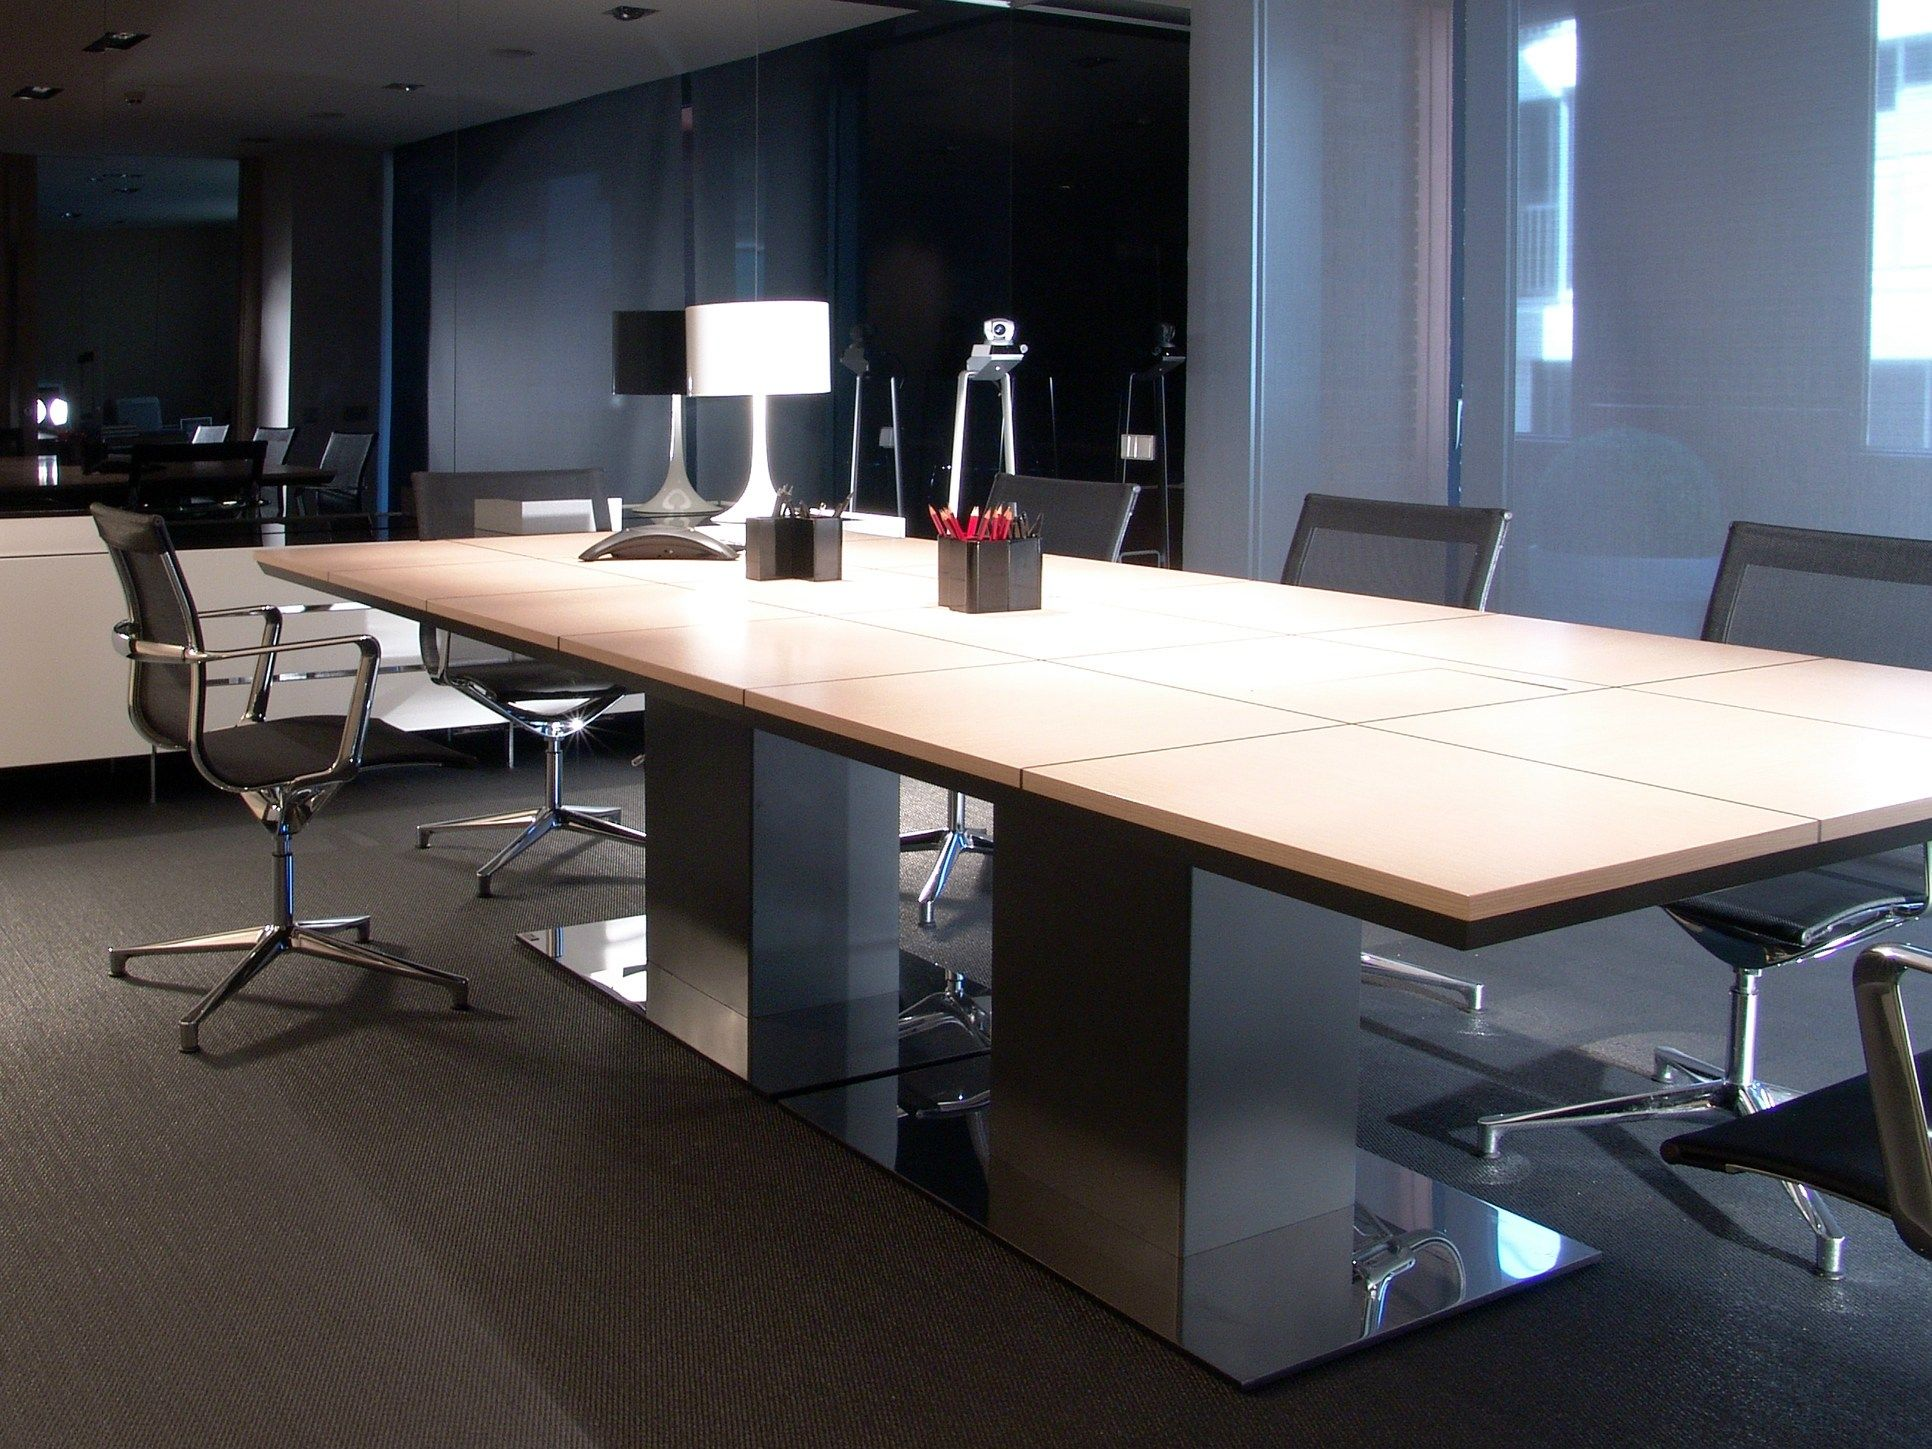 Mr 1 8 Rectangular Meeting Table By Jose Martinez Medina